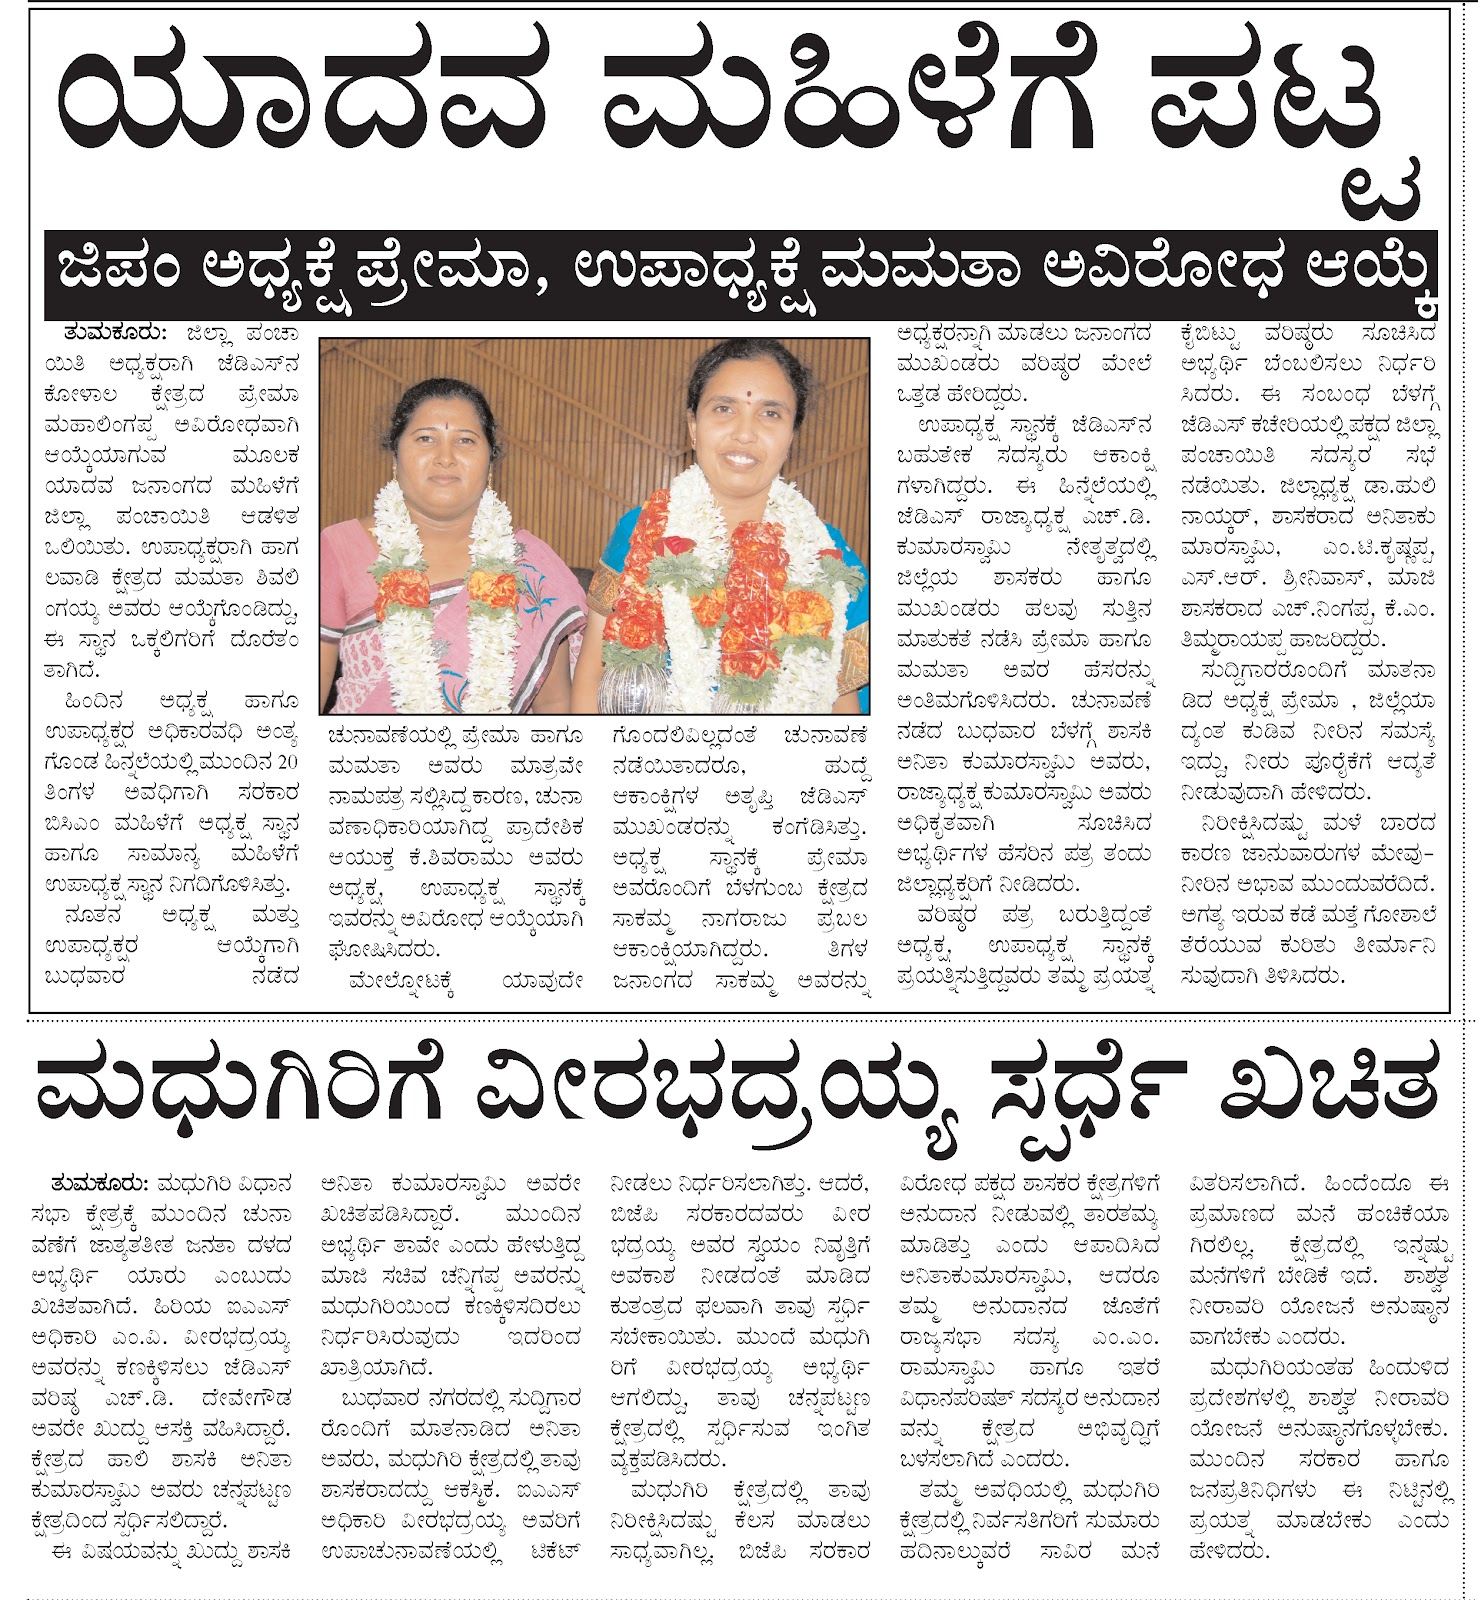 Kannada Prema Kavana Tumkur zp president prema